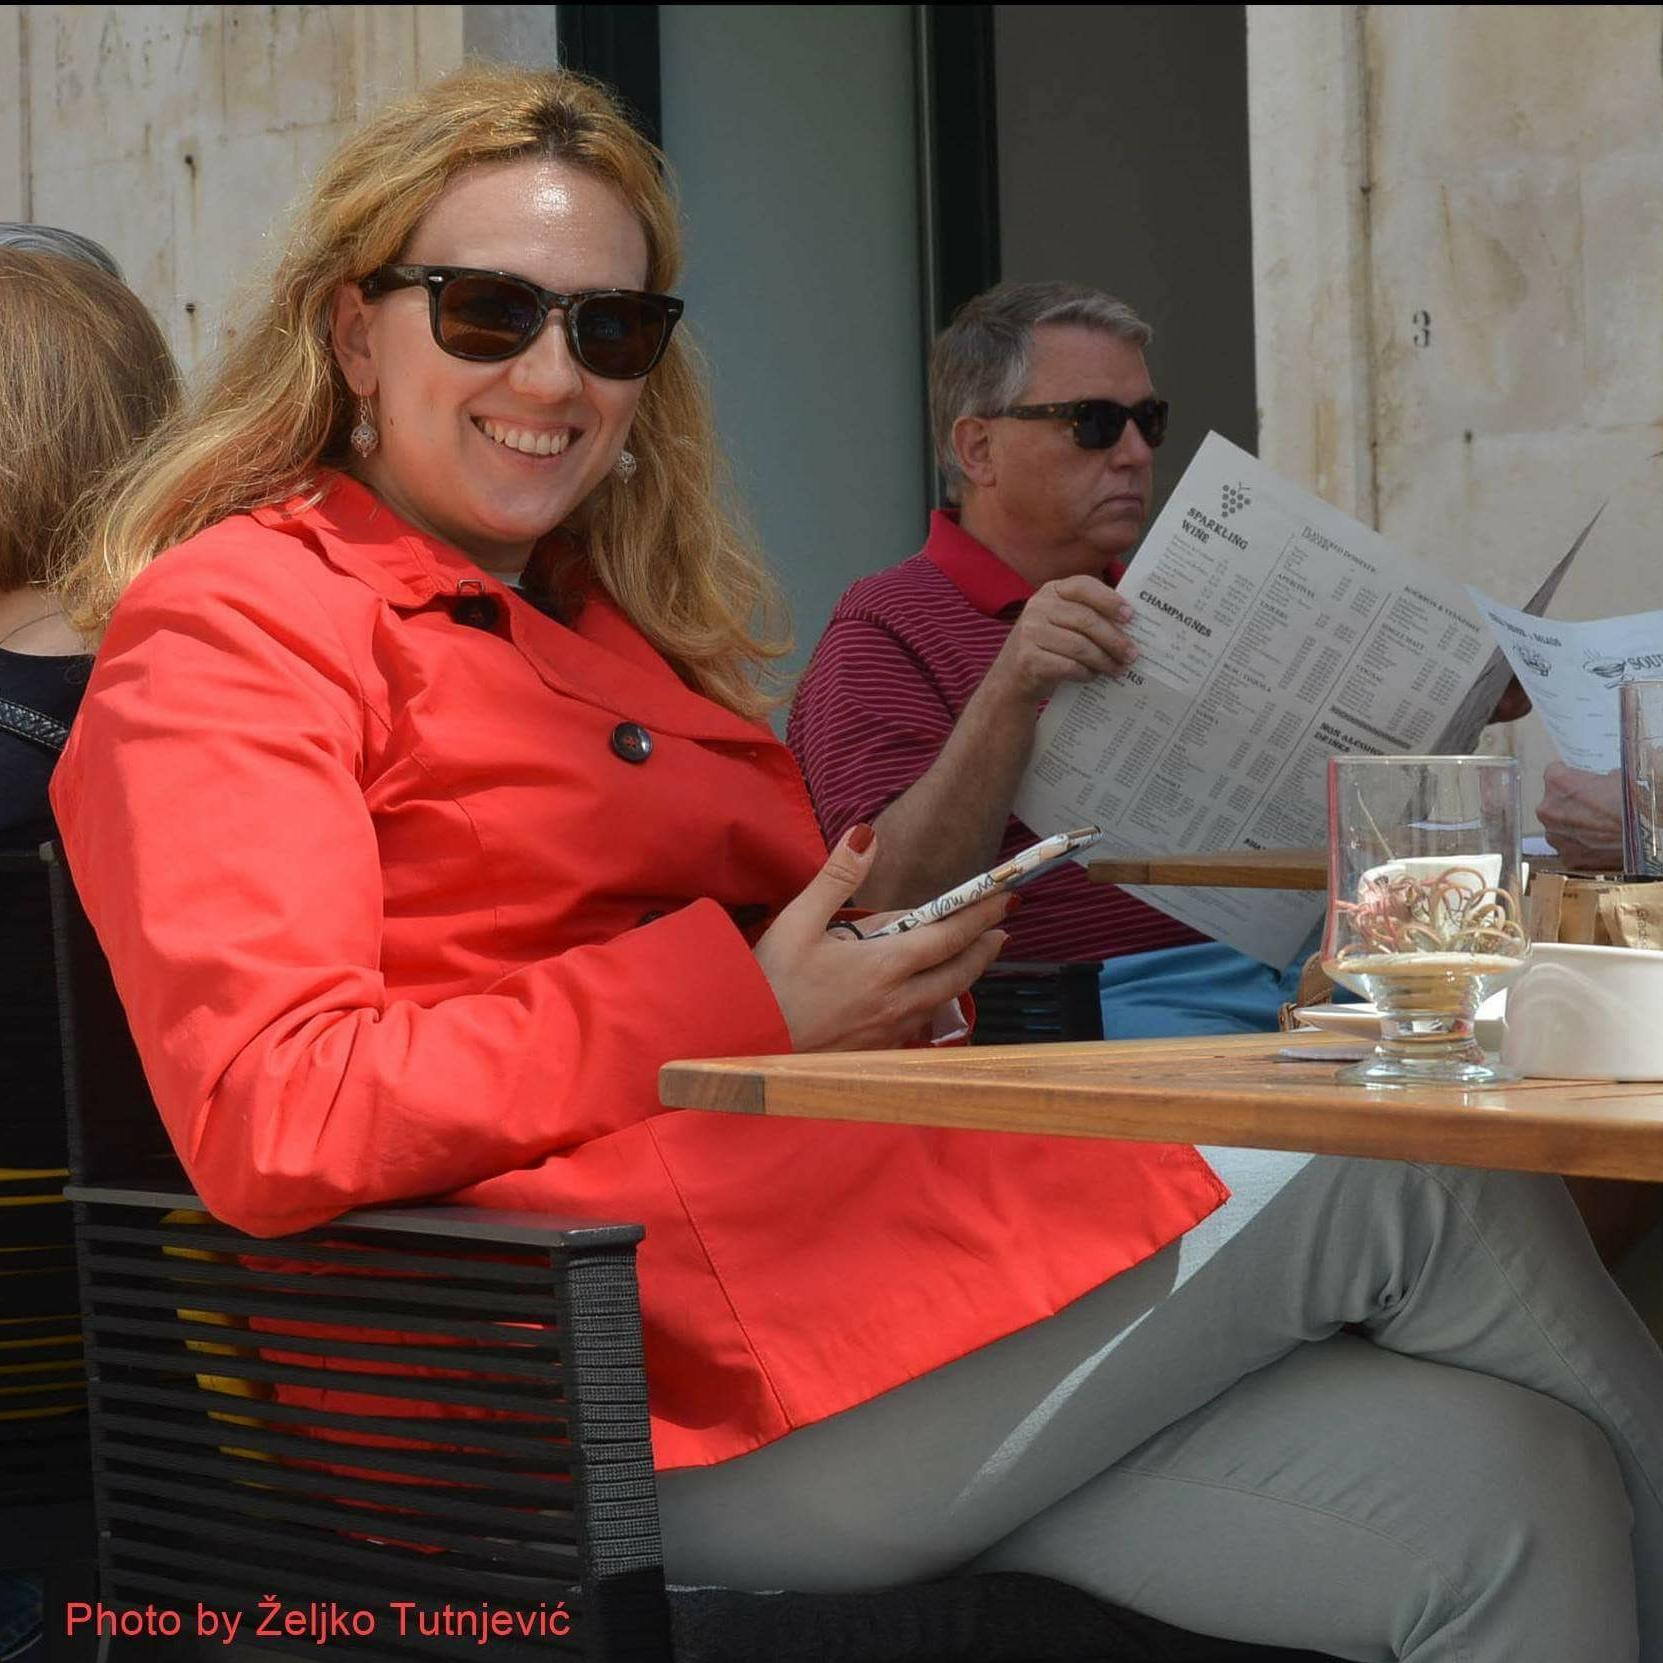 Tour guide Katica Tepavac (Dubrovnik, Croatia)